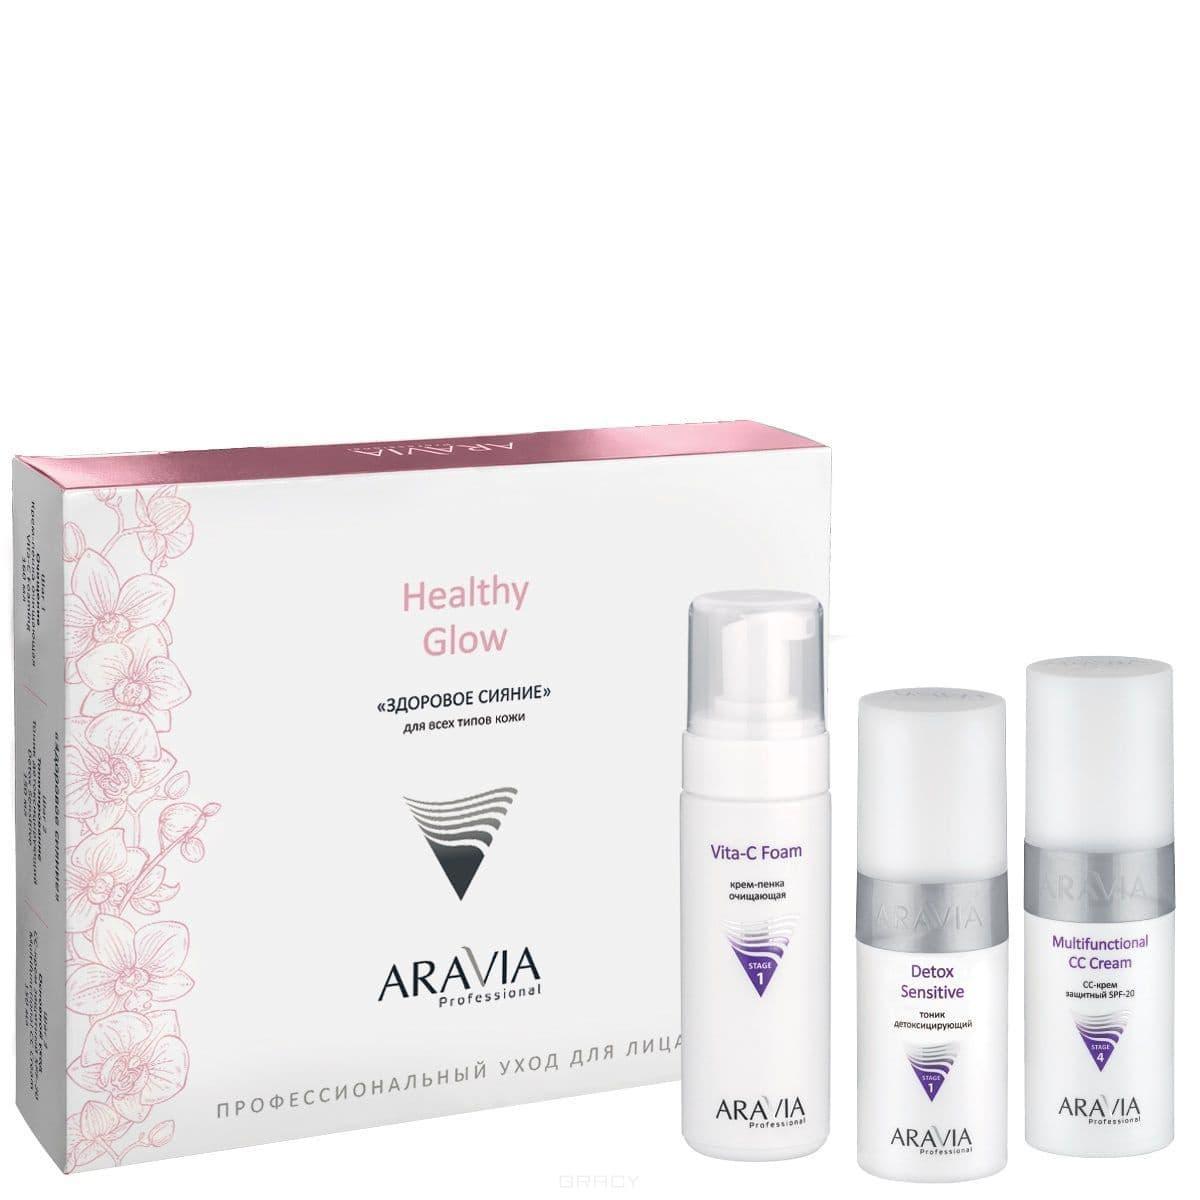 Aravia Набор для лица «Здоровое сияние», 2х150 мл+160 мл acanthopanax root extract powder